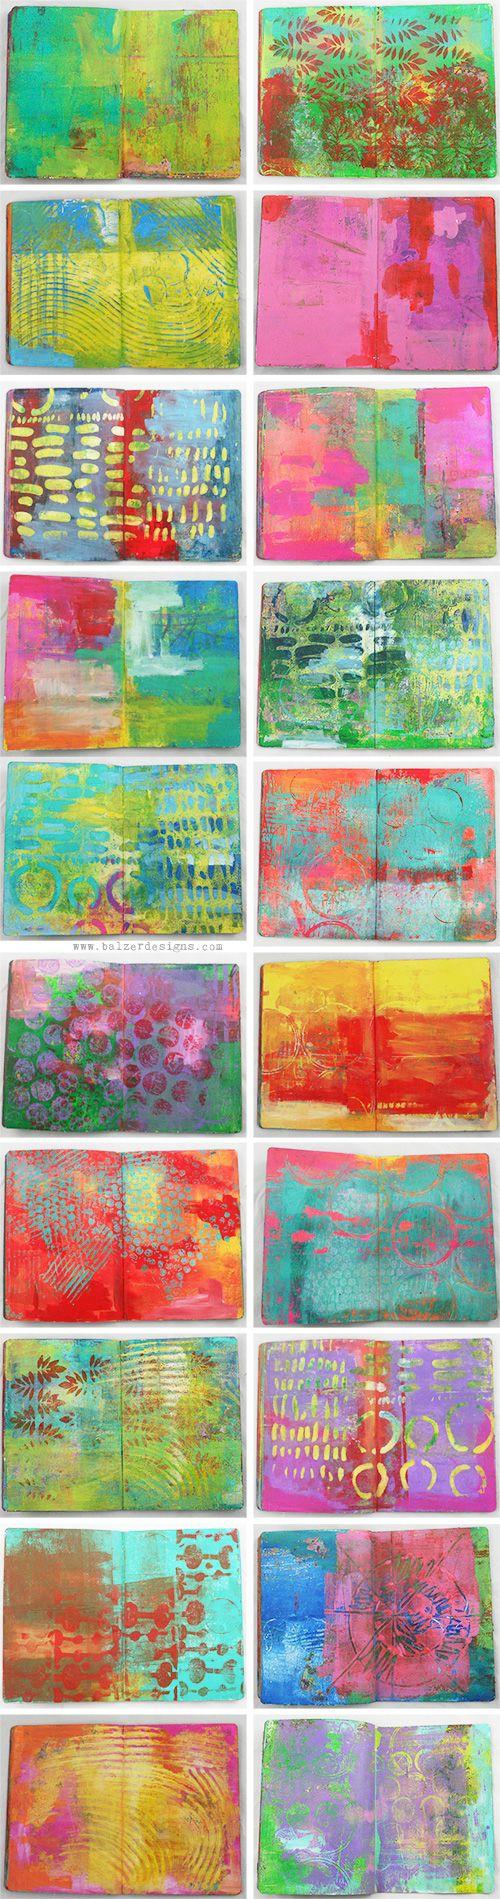 Art Journal Every Day: Gelli Printed Journals